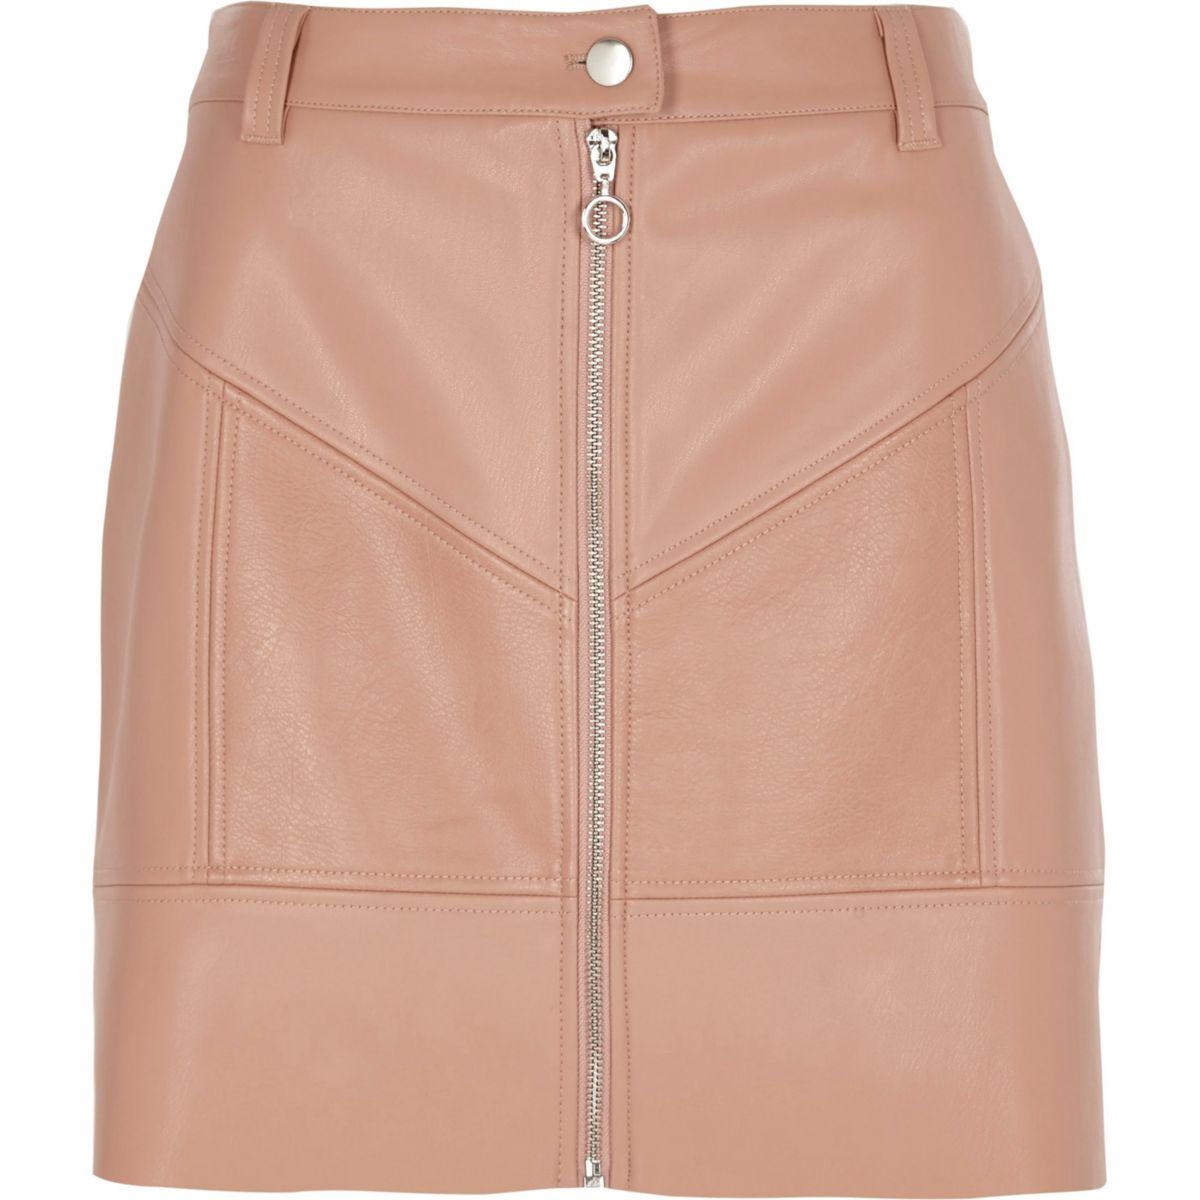 Beige faux leather zip front mini skirt